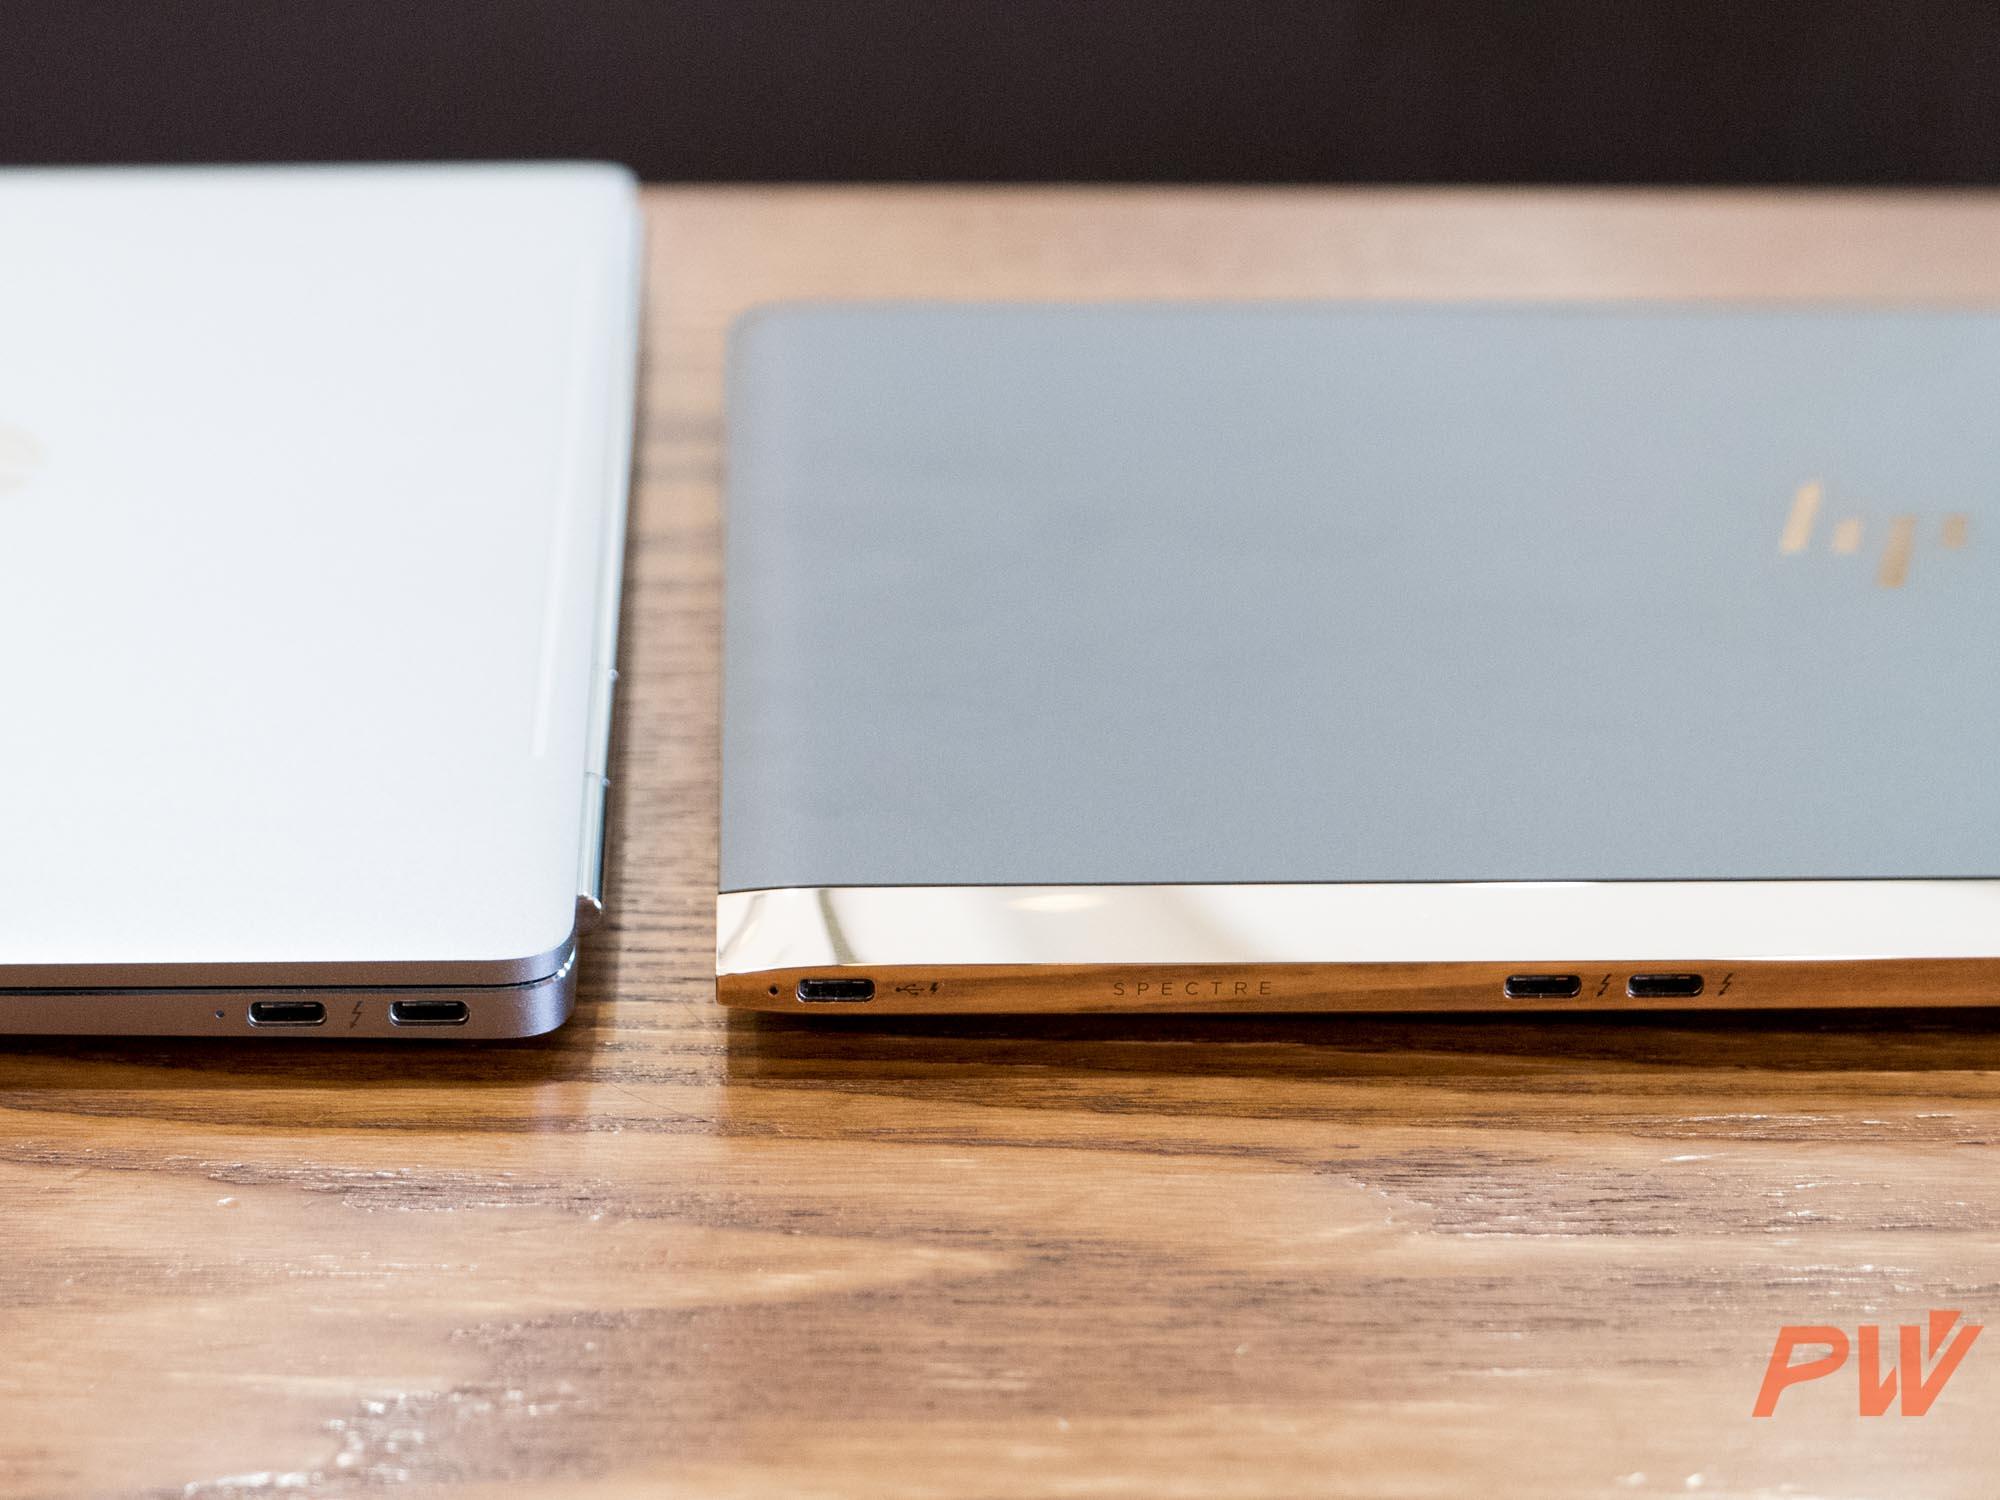 Folio G1 和 Spectre 13 2016 分别配备两个和三个 USB-C 接口,每个均可以插入电源给机身供电。